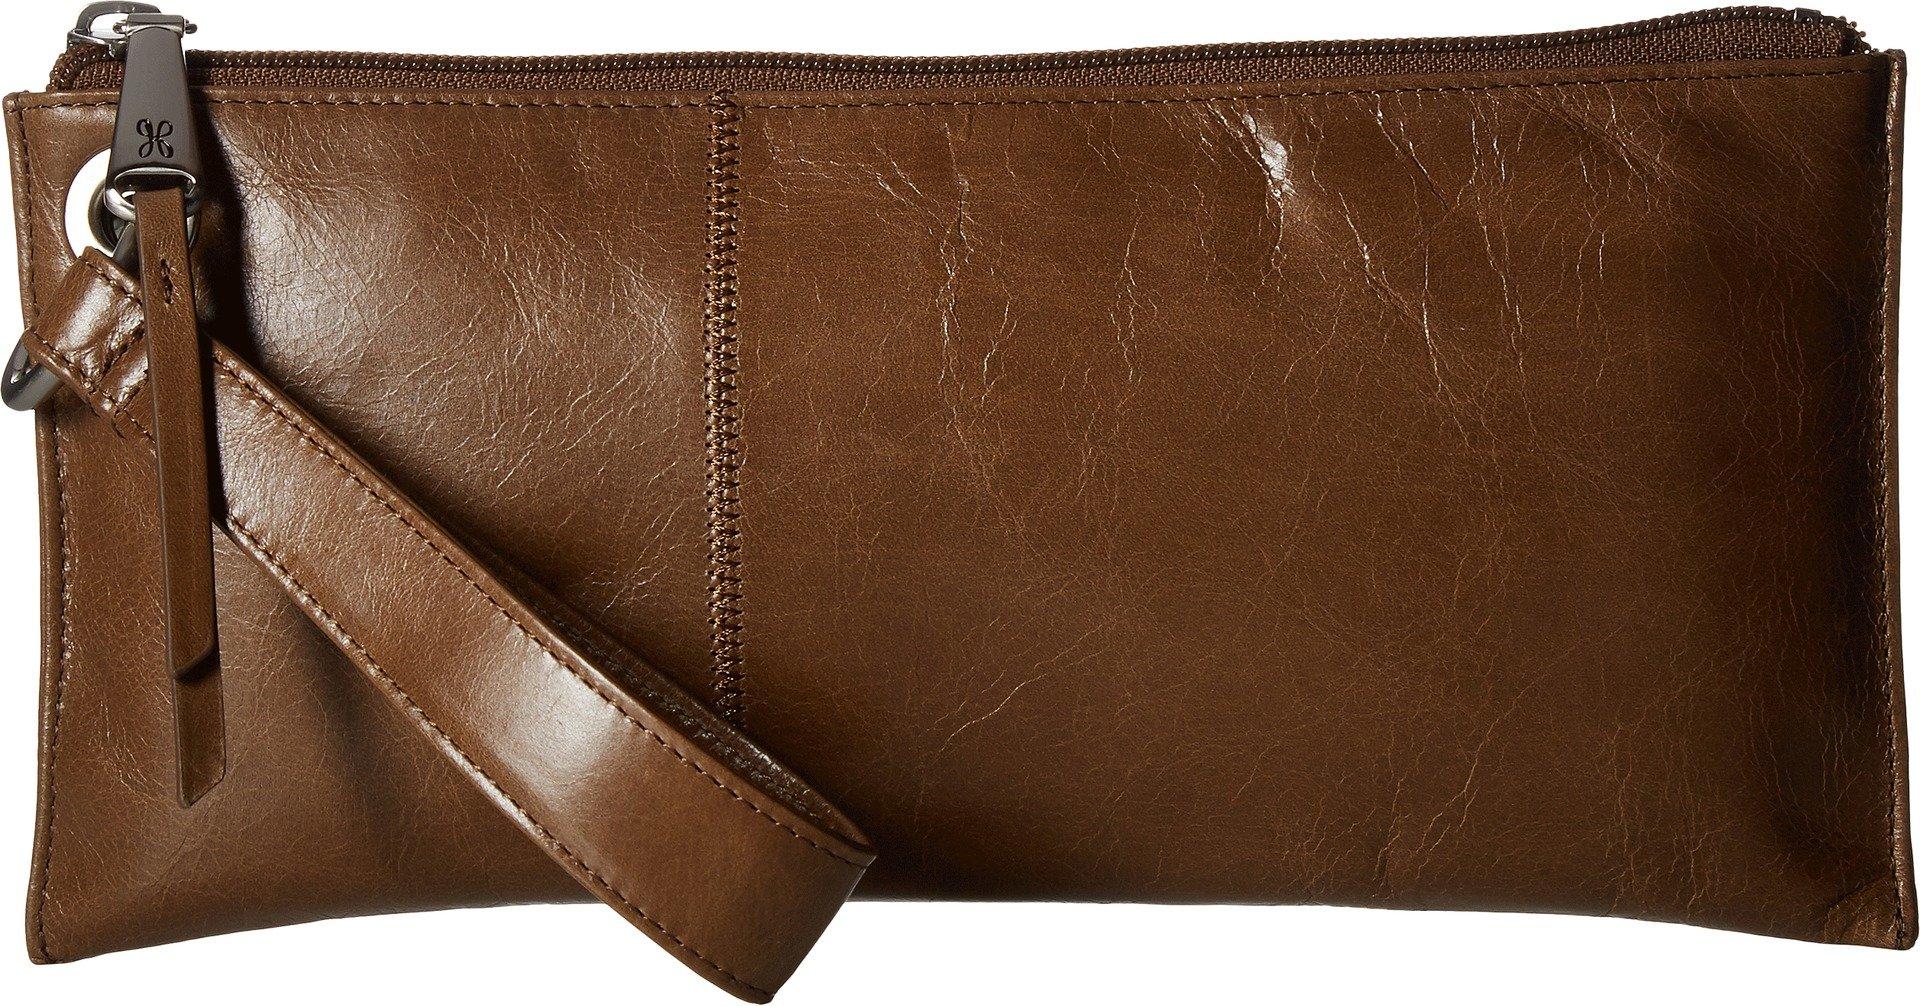 Hobo Womens Leather Vintage Vida Clutch Wallet (Mink)